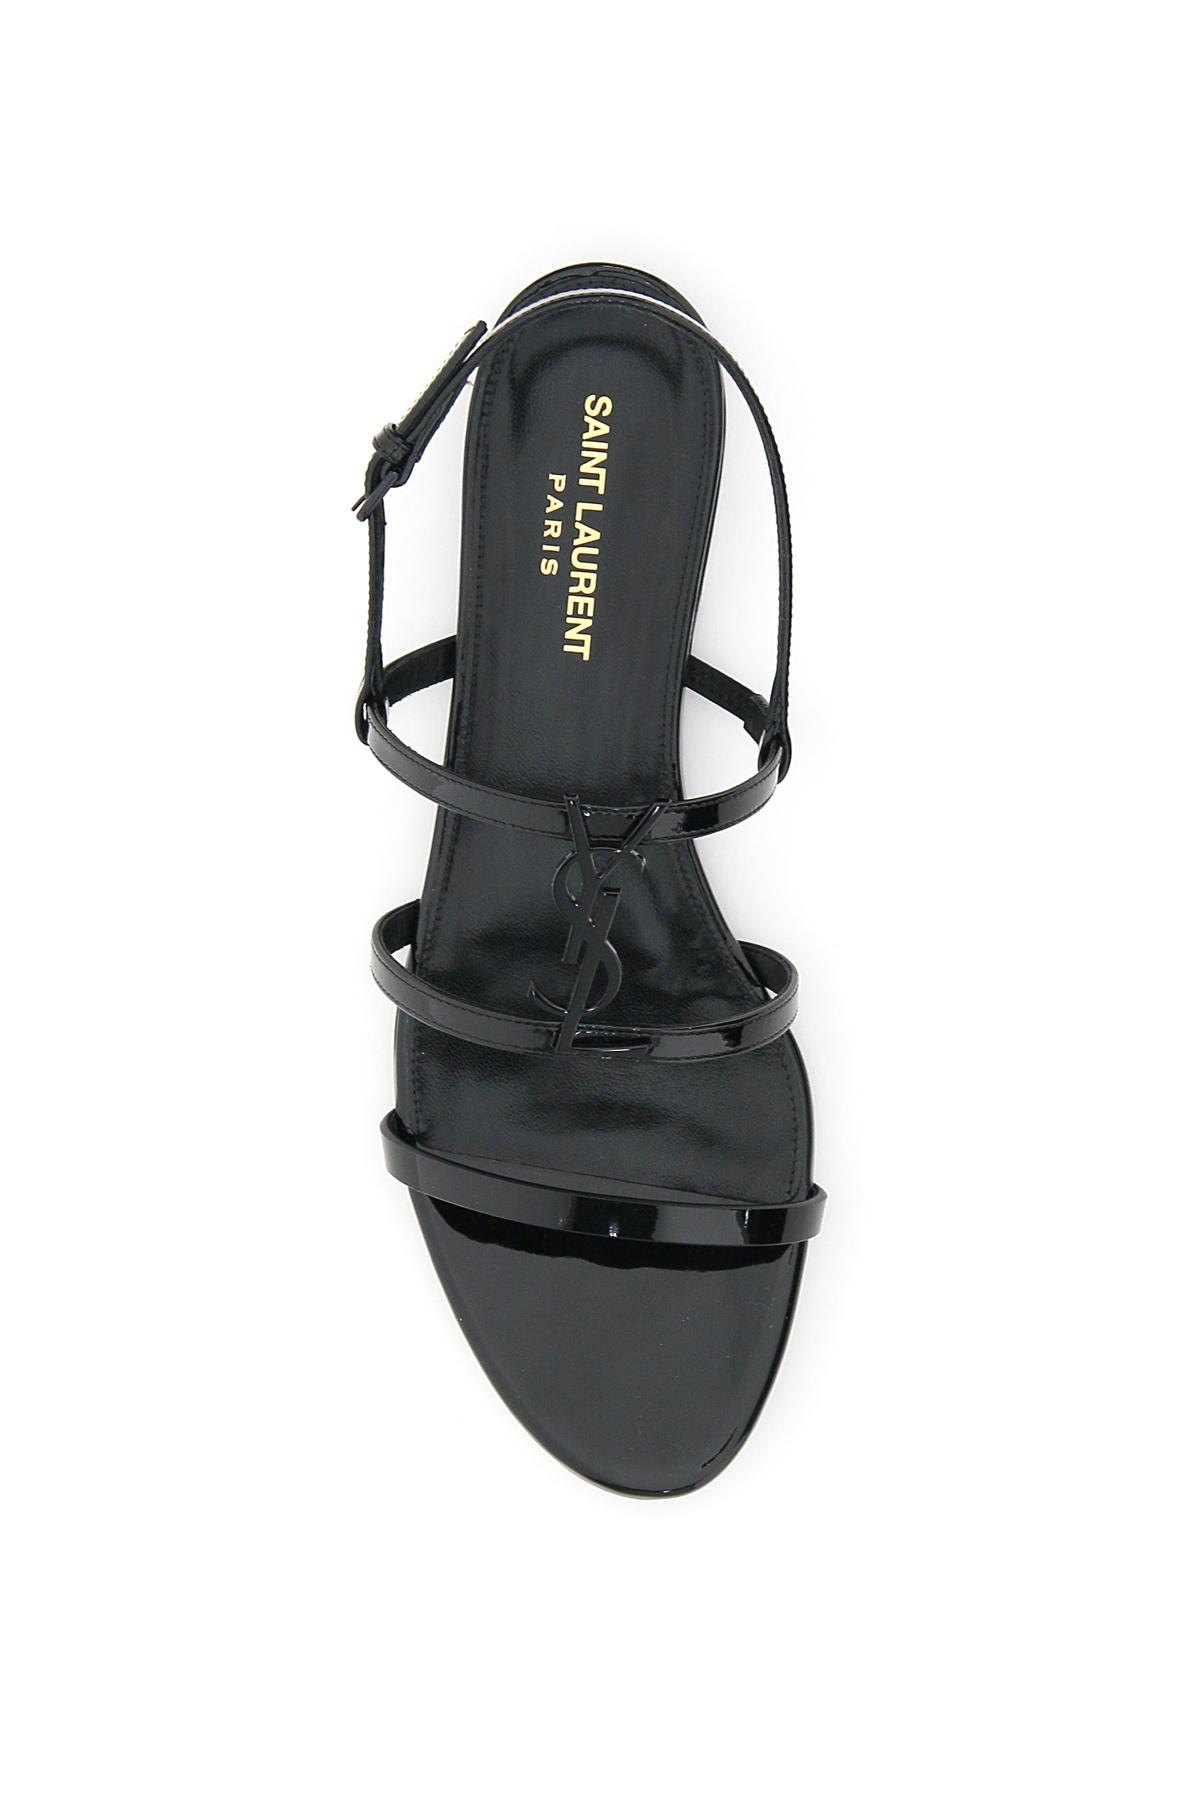 Saint laurent sandali ysl cassandra flat